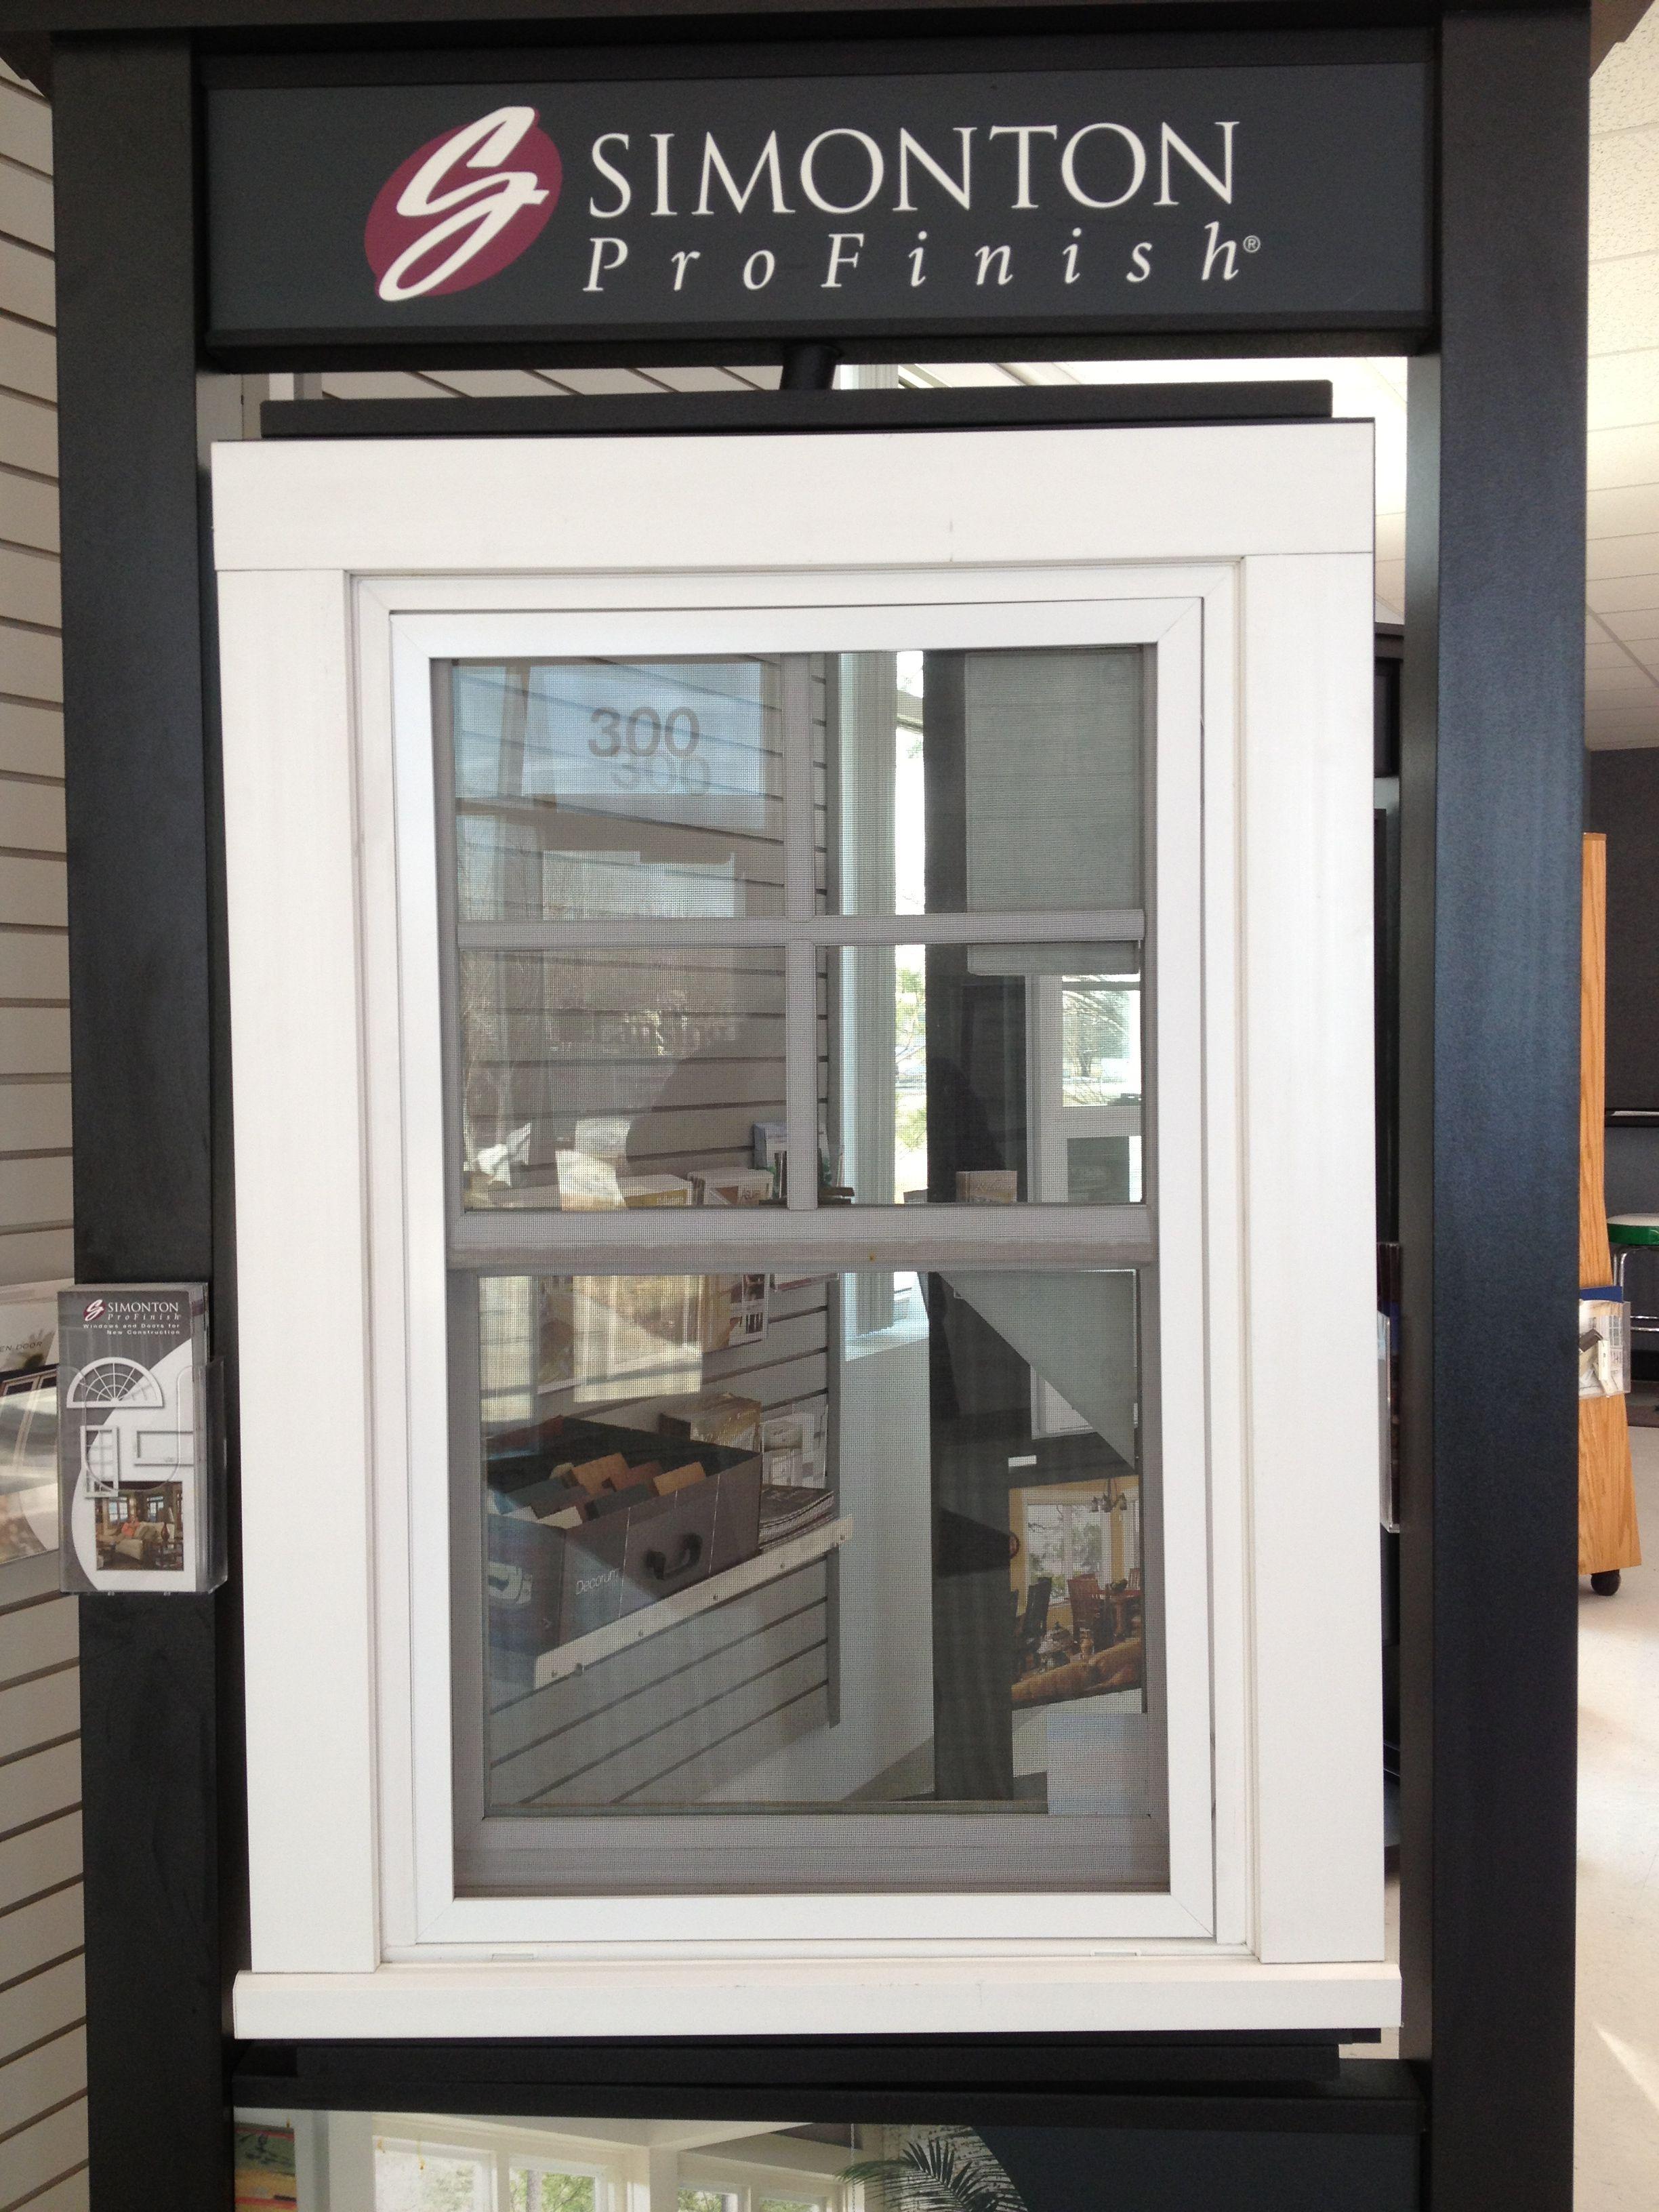 Simonton Profinish Double Hung Vinyl White With 3 Exterior Casing Window Casing House Exterior Simonton